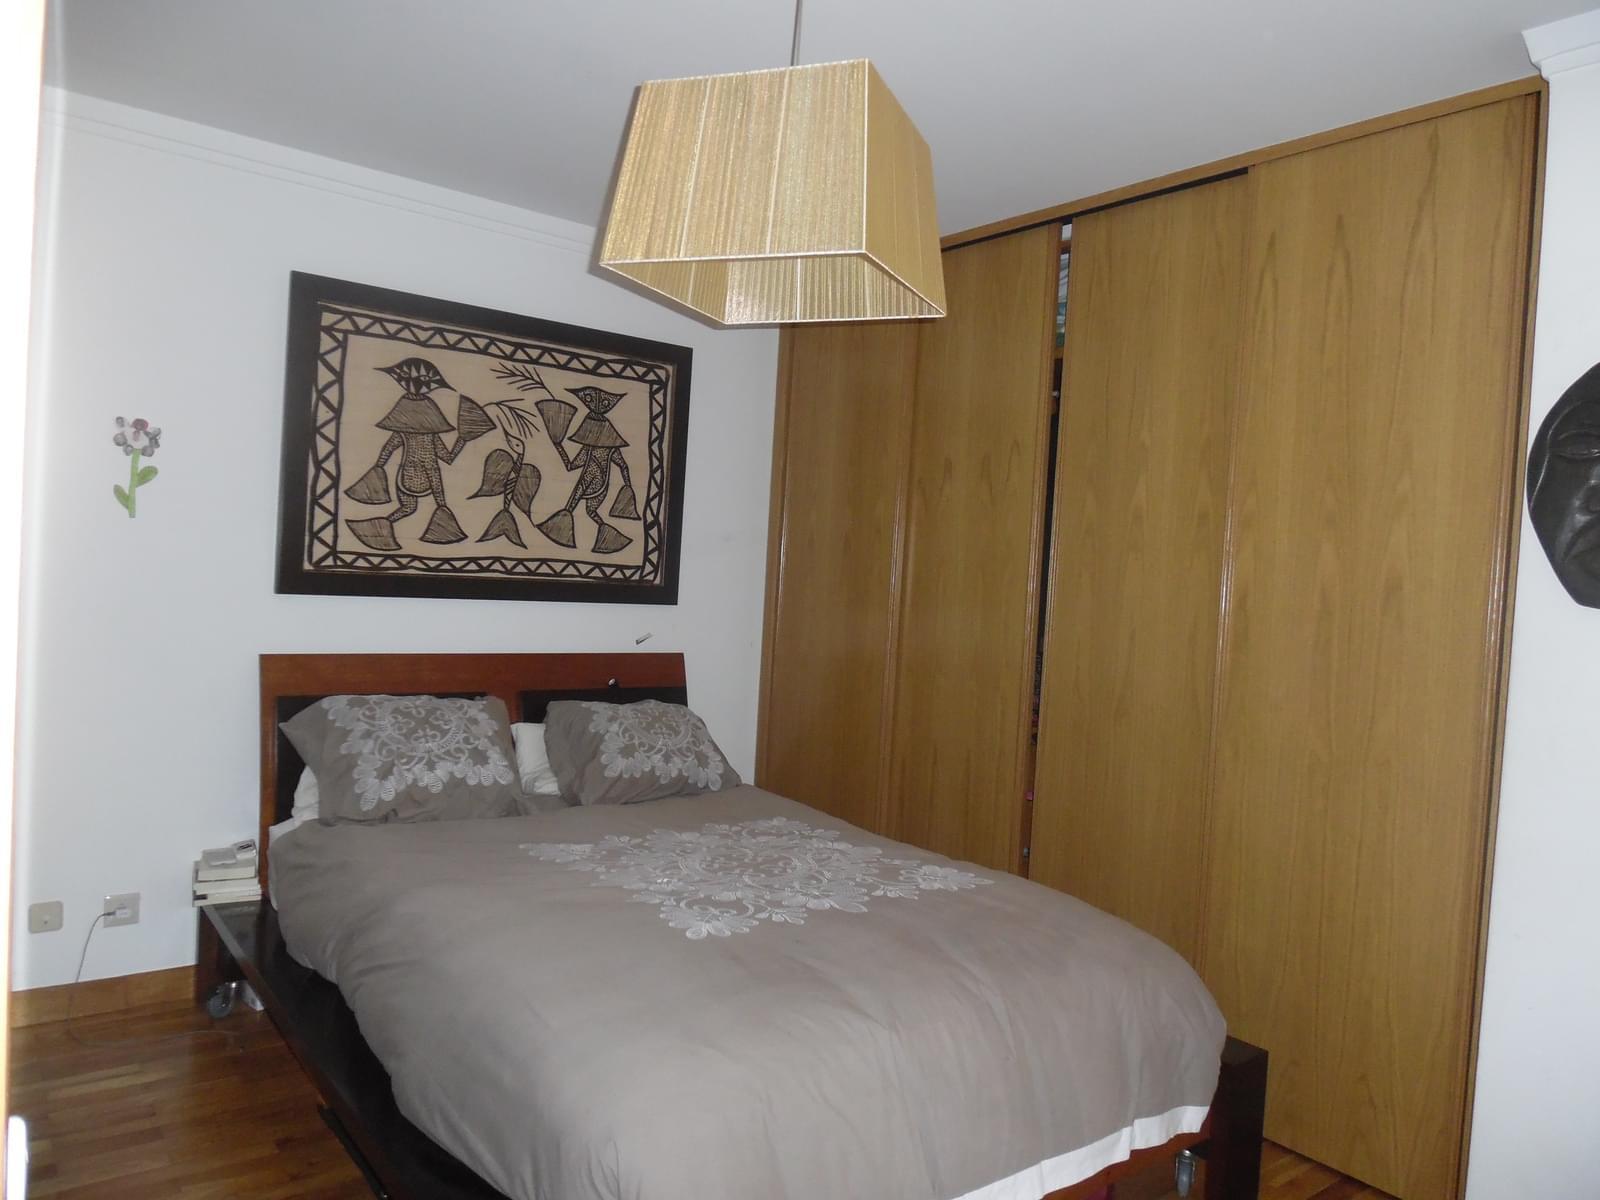 pf17977-apartamento-t2-lisboa-d08c445b-c5a9-4220-bccc-f198a4b9fed2